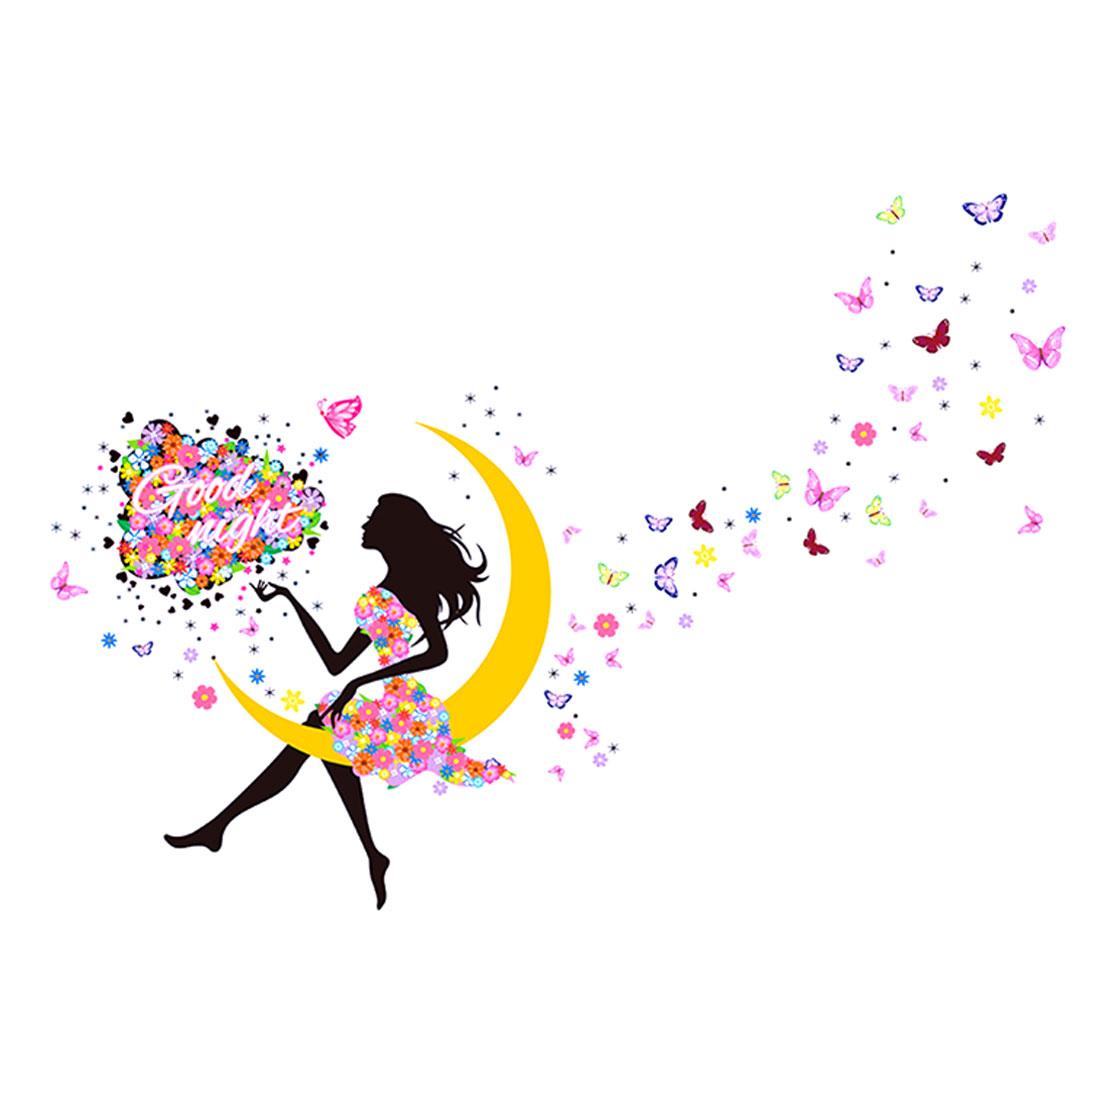 Good Night Moon Flower Girl Pattern Wall Sticker Removable Art Vinyl Decal DIY